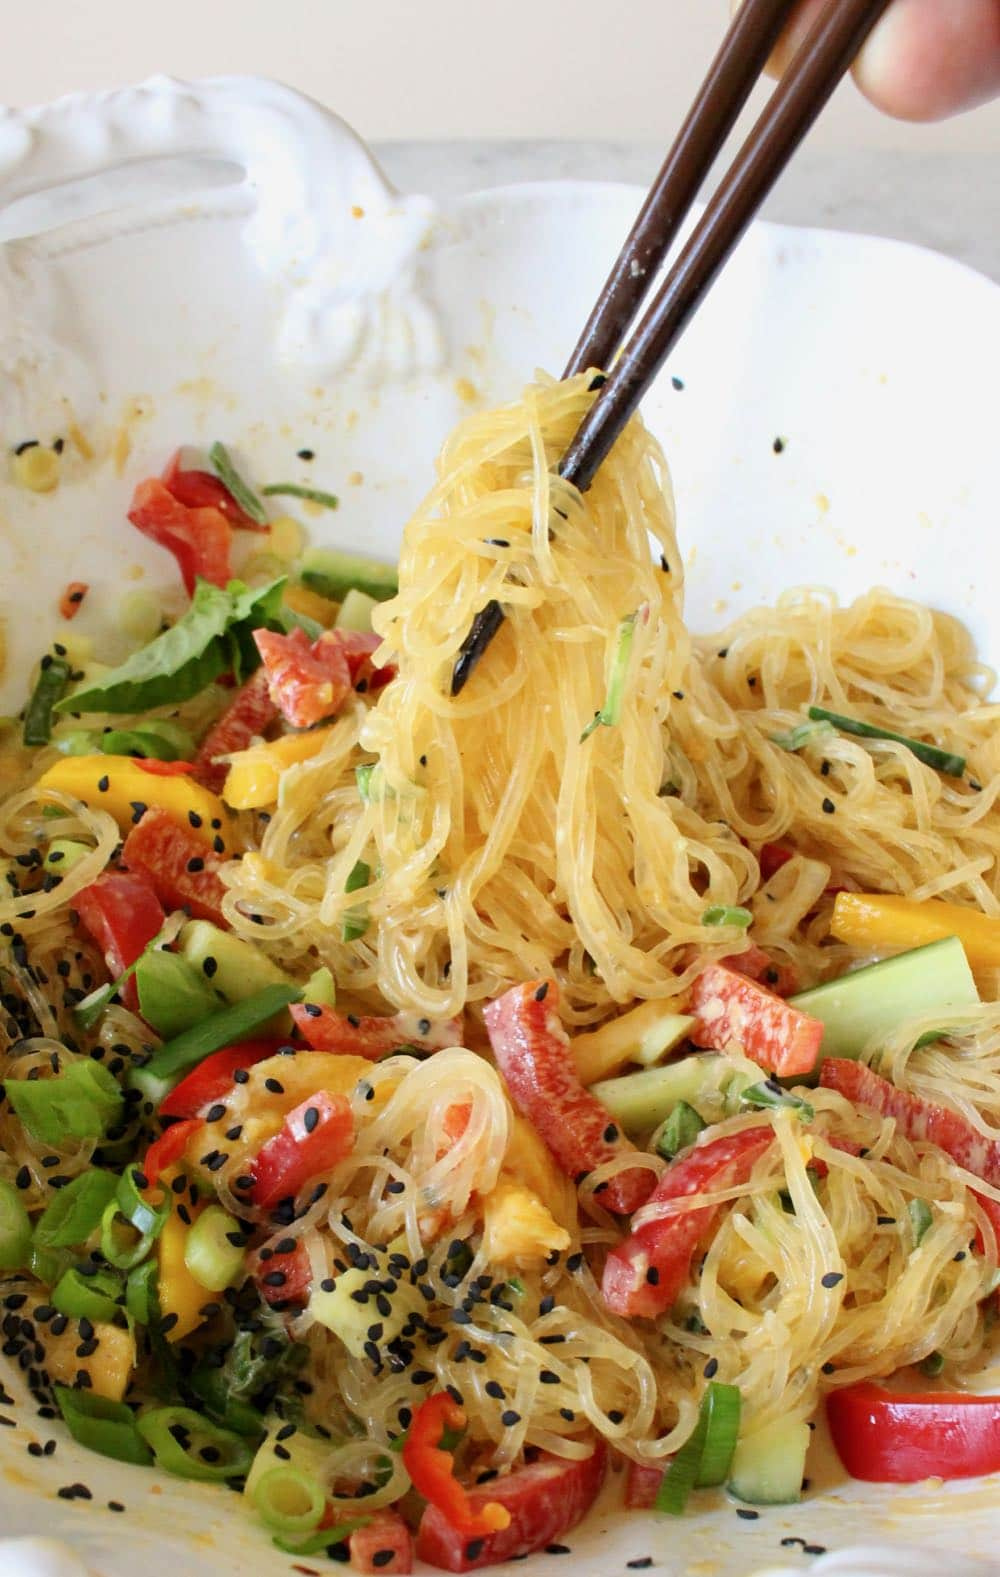 Kelp noodle salad with spicy peanut sauce, mango and veggies.